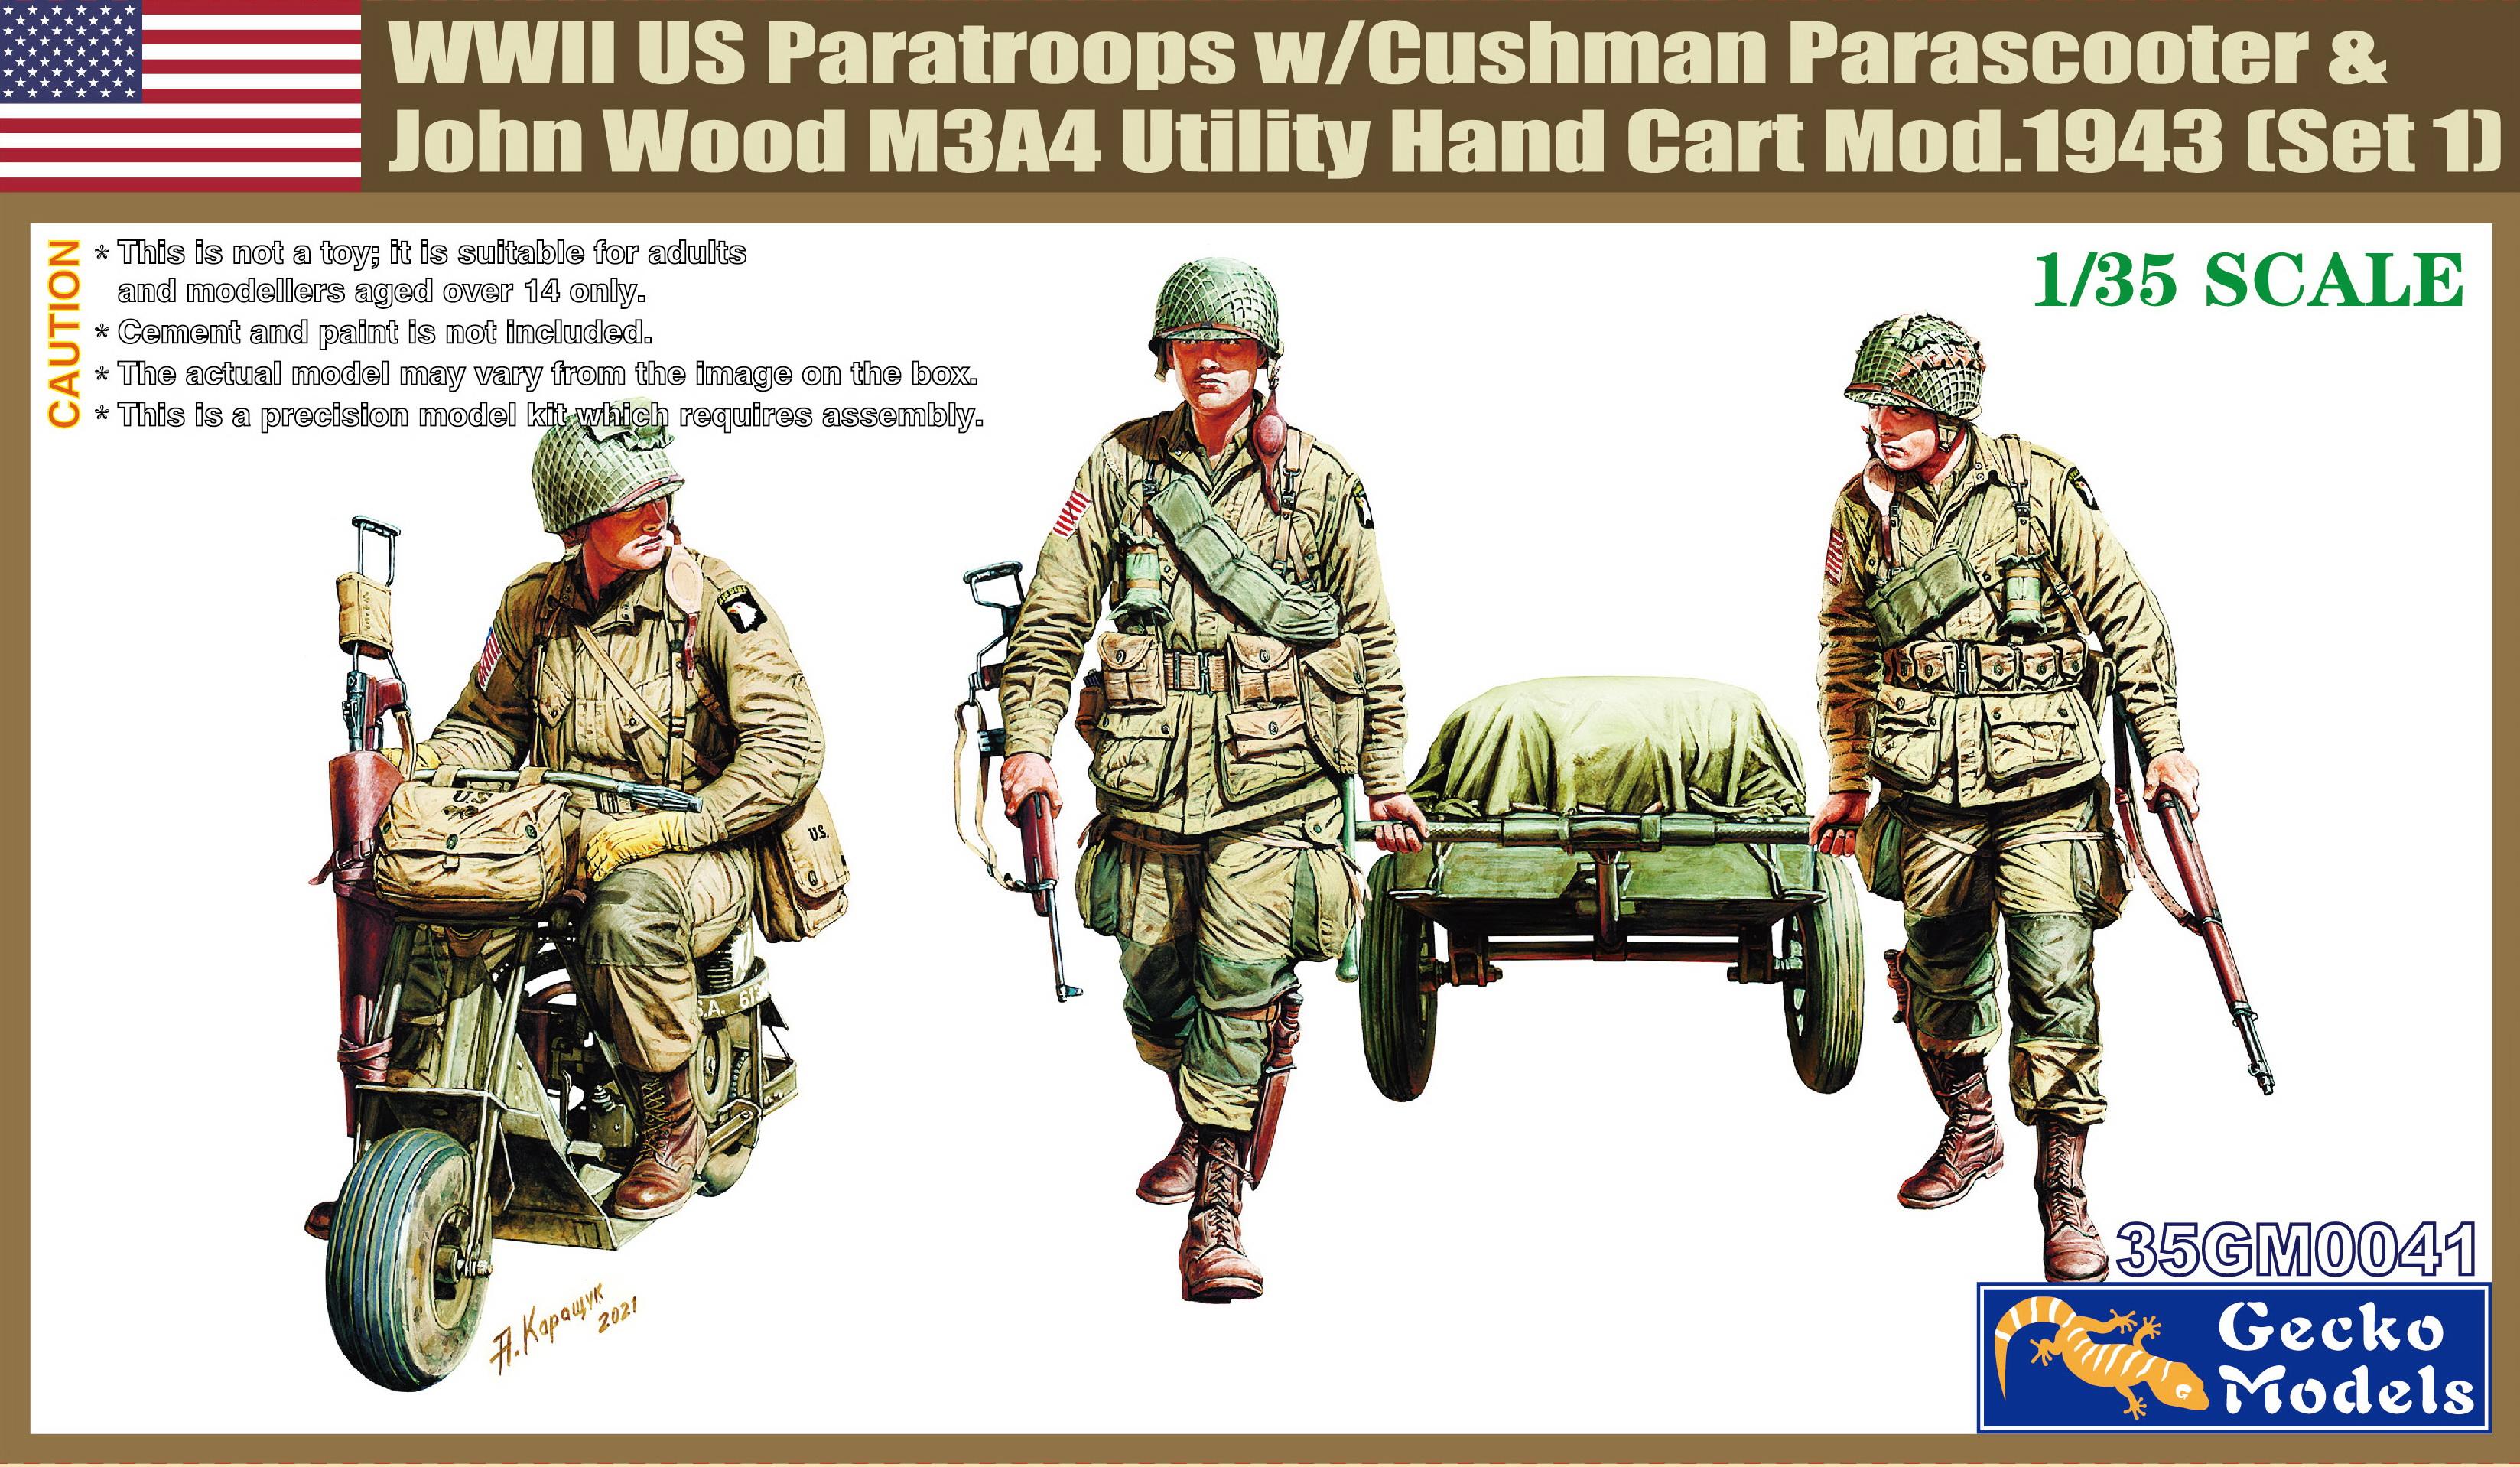 Gecko 1/35 M53 Scooter Cushman w-John Wood M3A4 Utility Hand Cart Mod. 1943 & US Paratroops (Set 1)